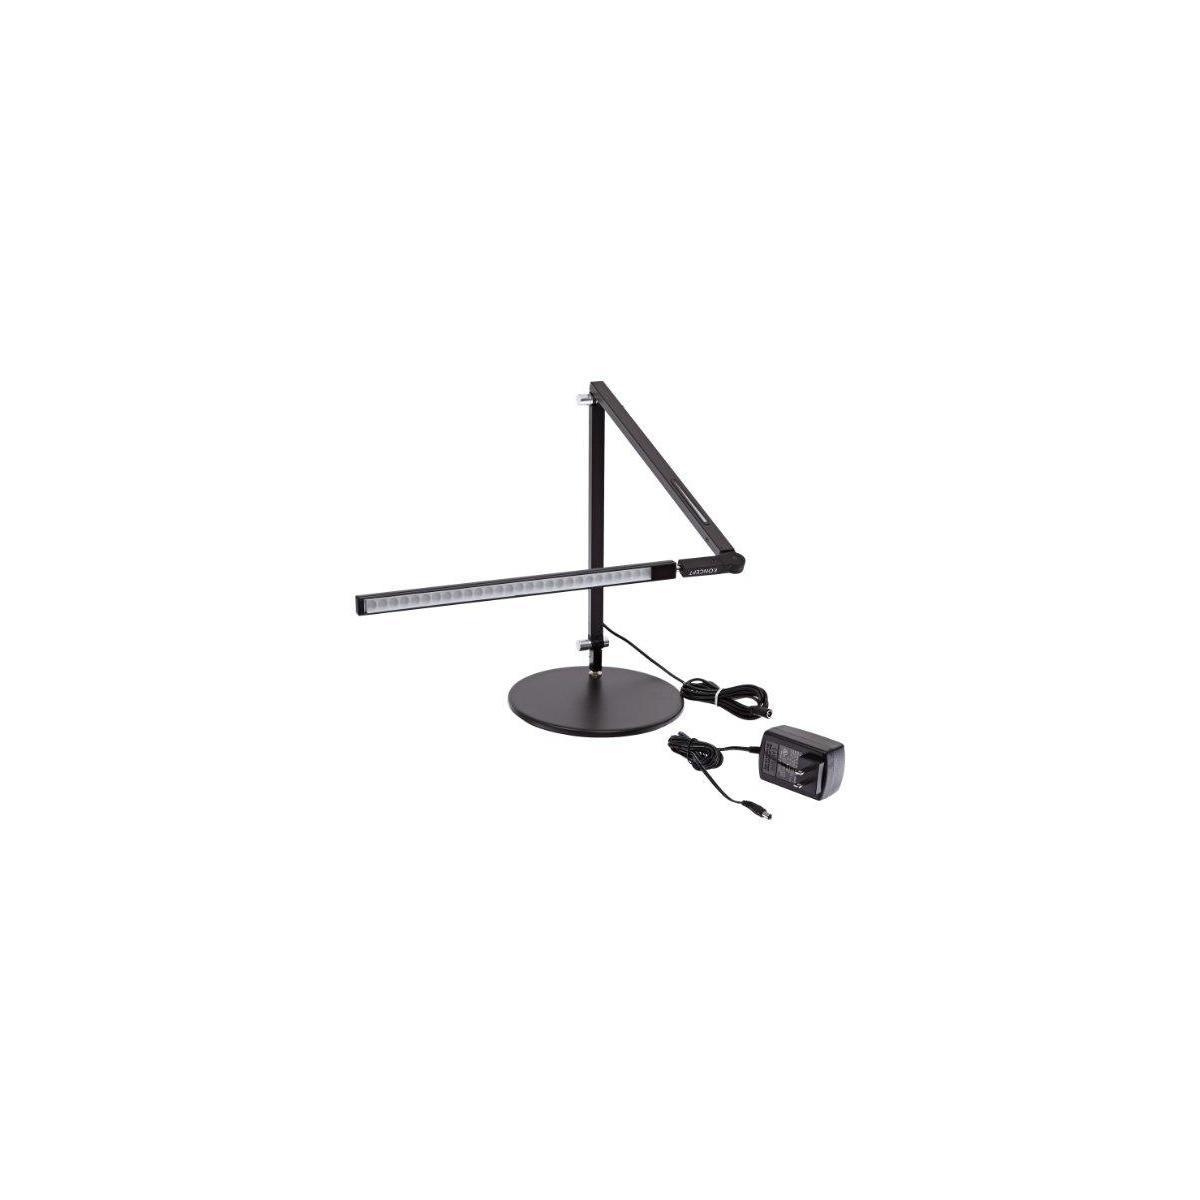 Koncept AR3100-W-MBK-DSK Z-Bar Mini LED Desk Lamp, Warm Light, Metallic Black